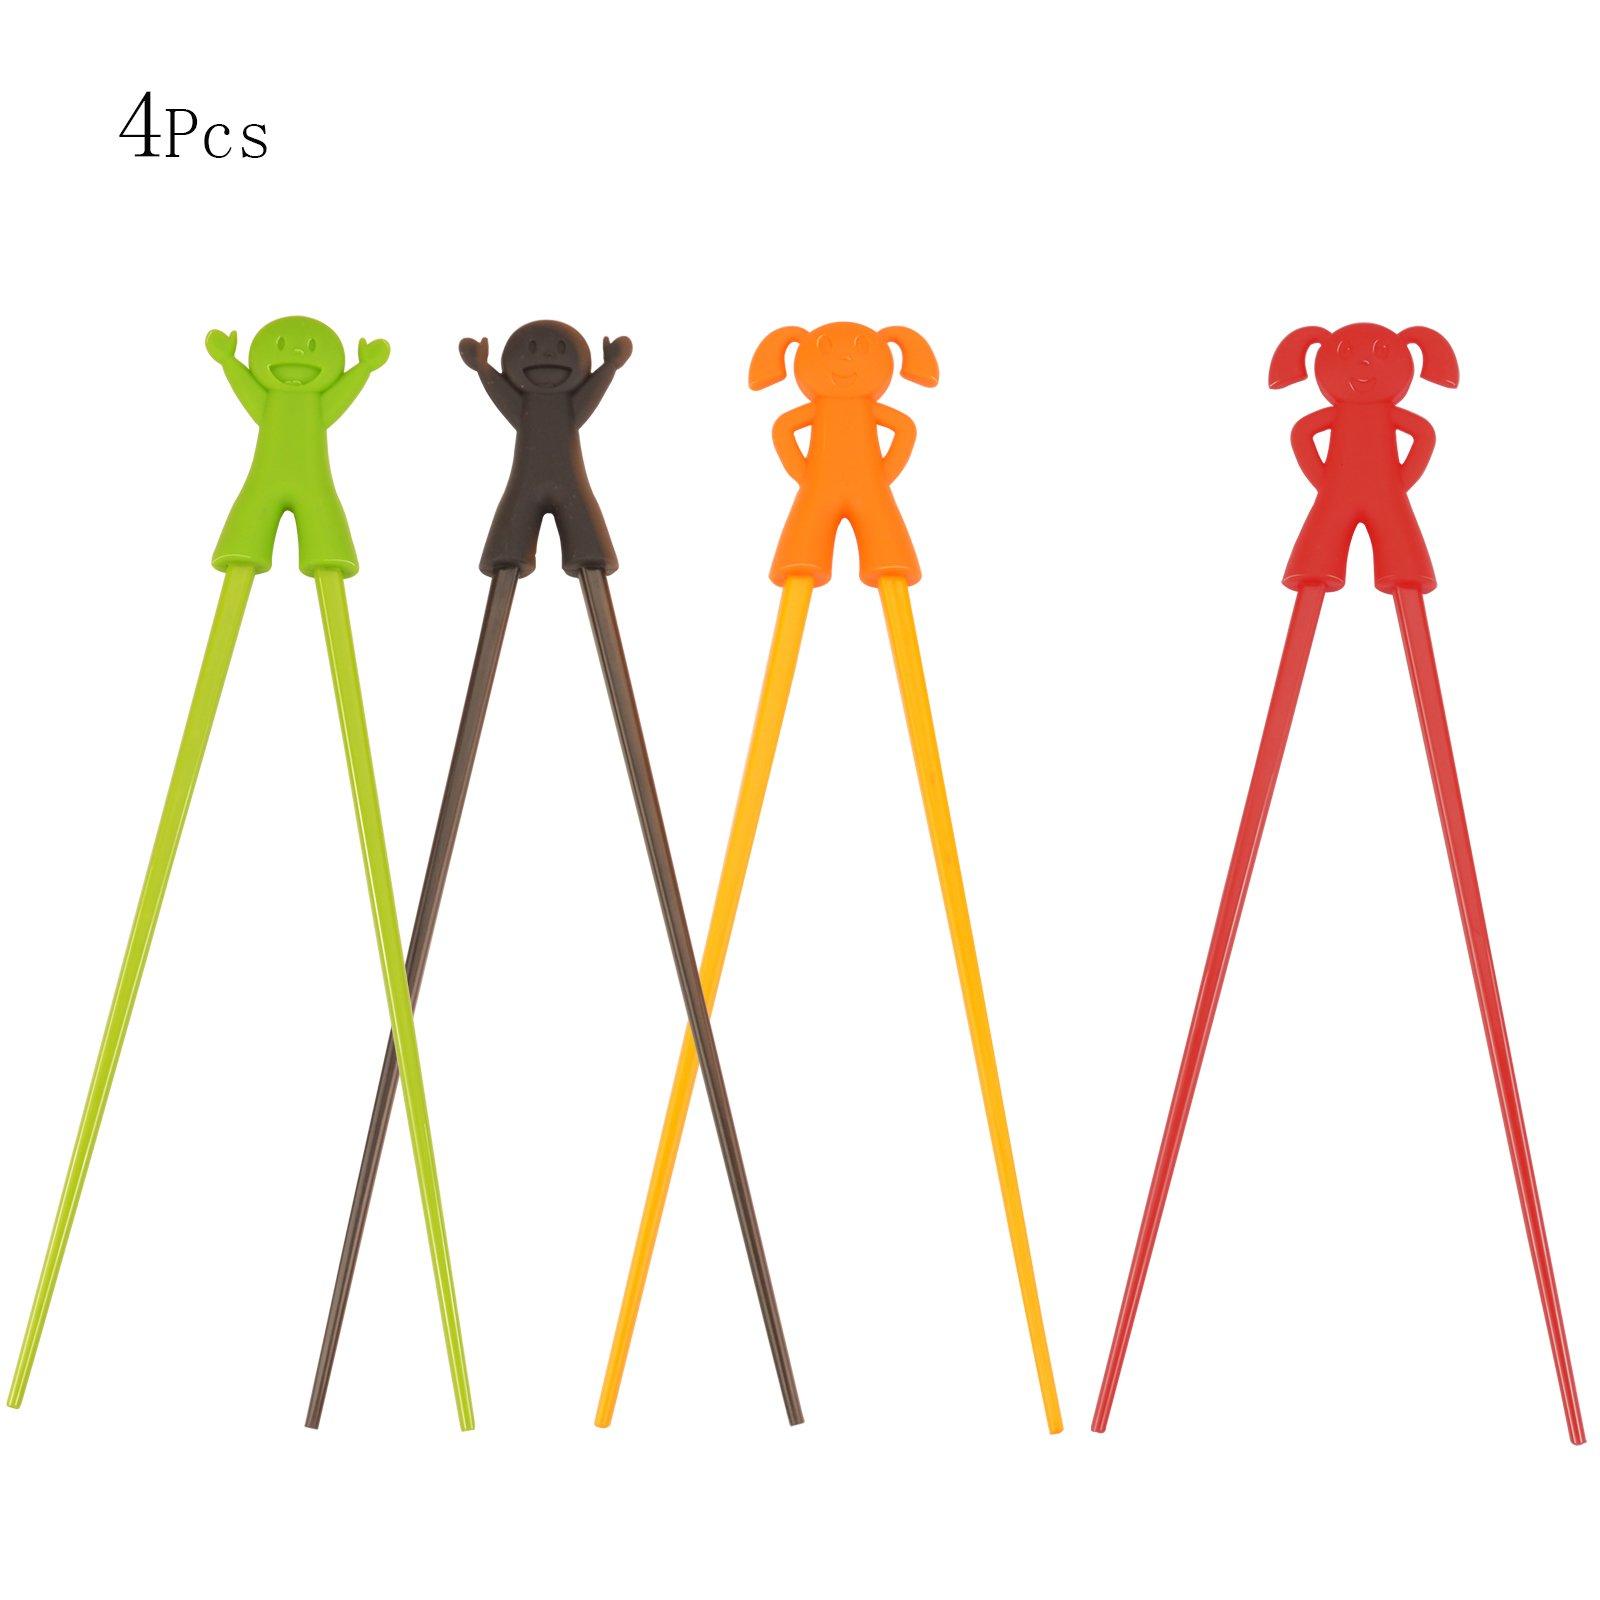 KAKOO Training Chopsticks, 4 Pairs Chopsticks Helper Cartoon Characters Serise Chopsticks Utensil Set for Kids and Adults